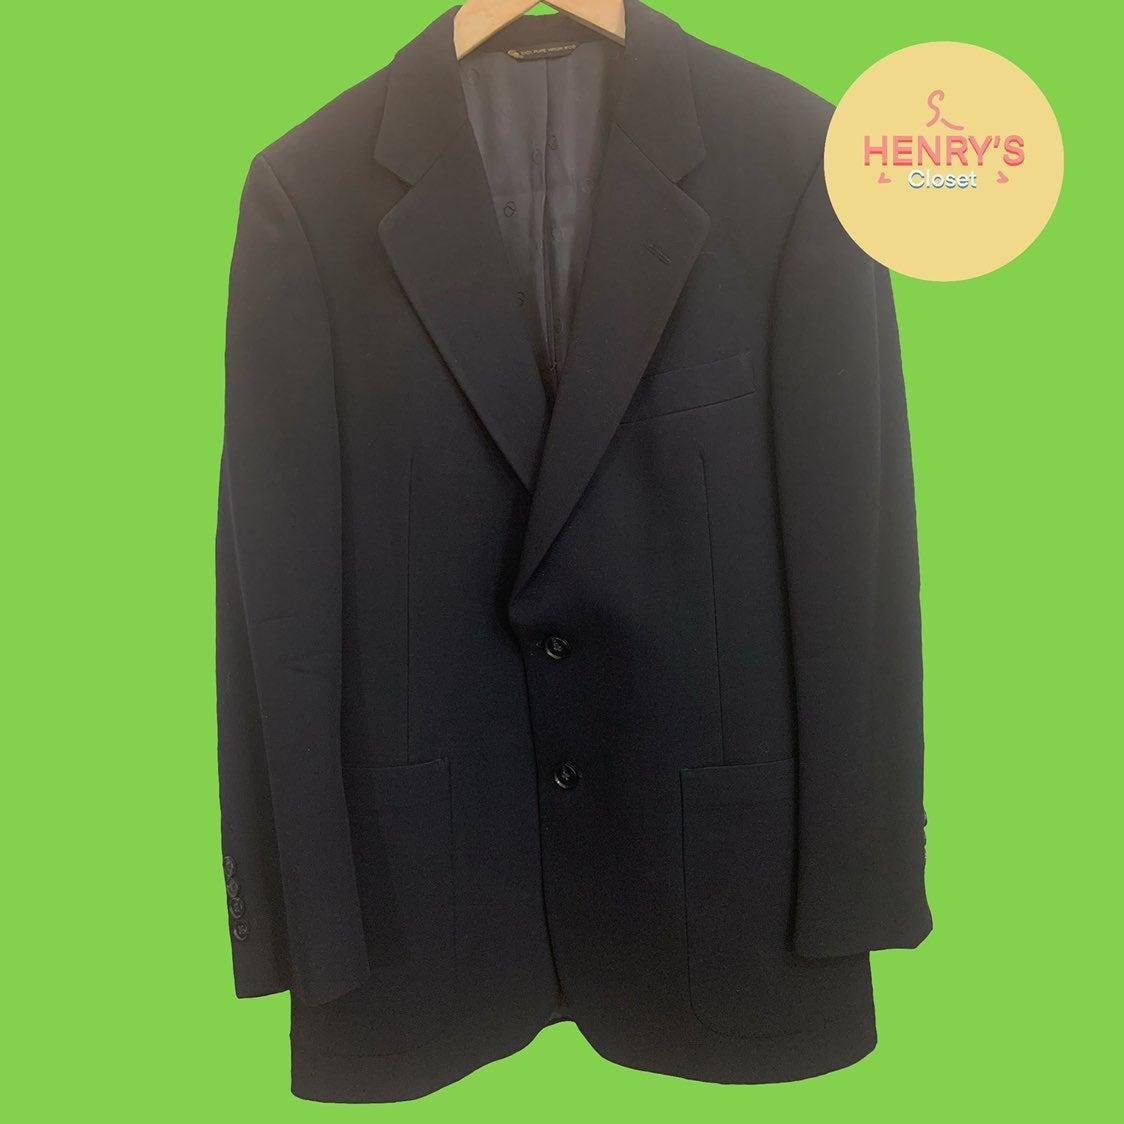 Vintage Christian Dior Men's Navy Suit